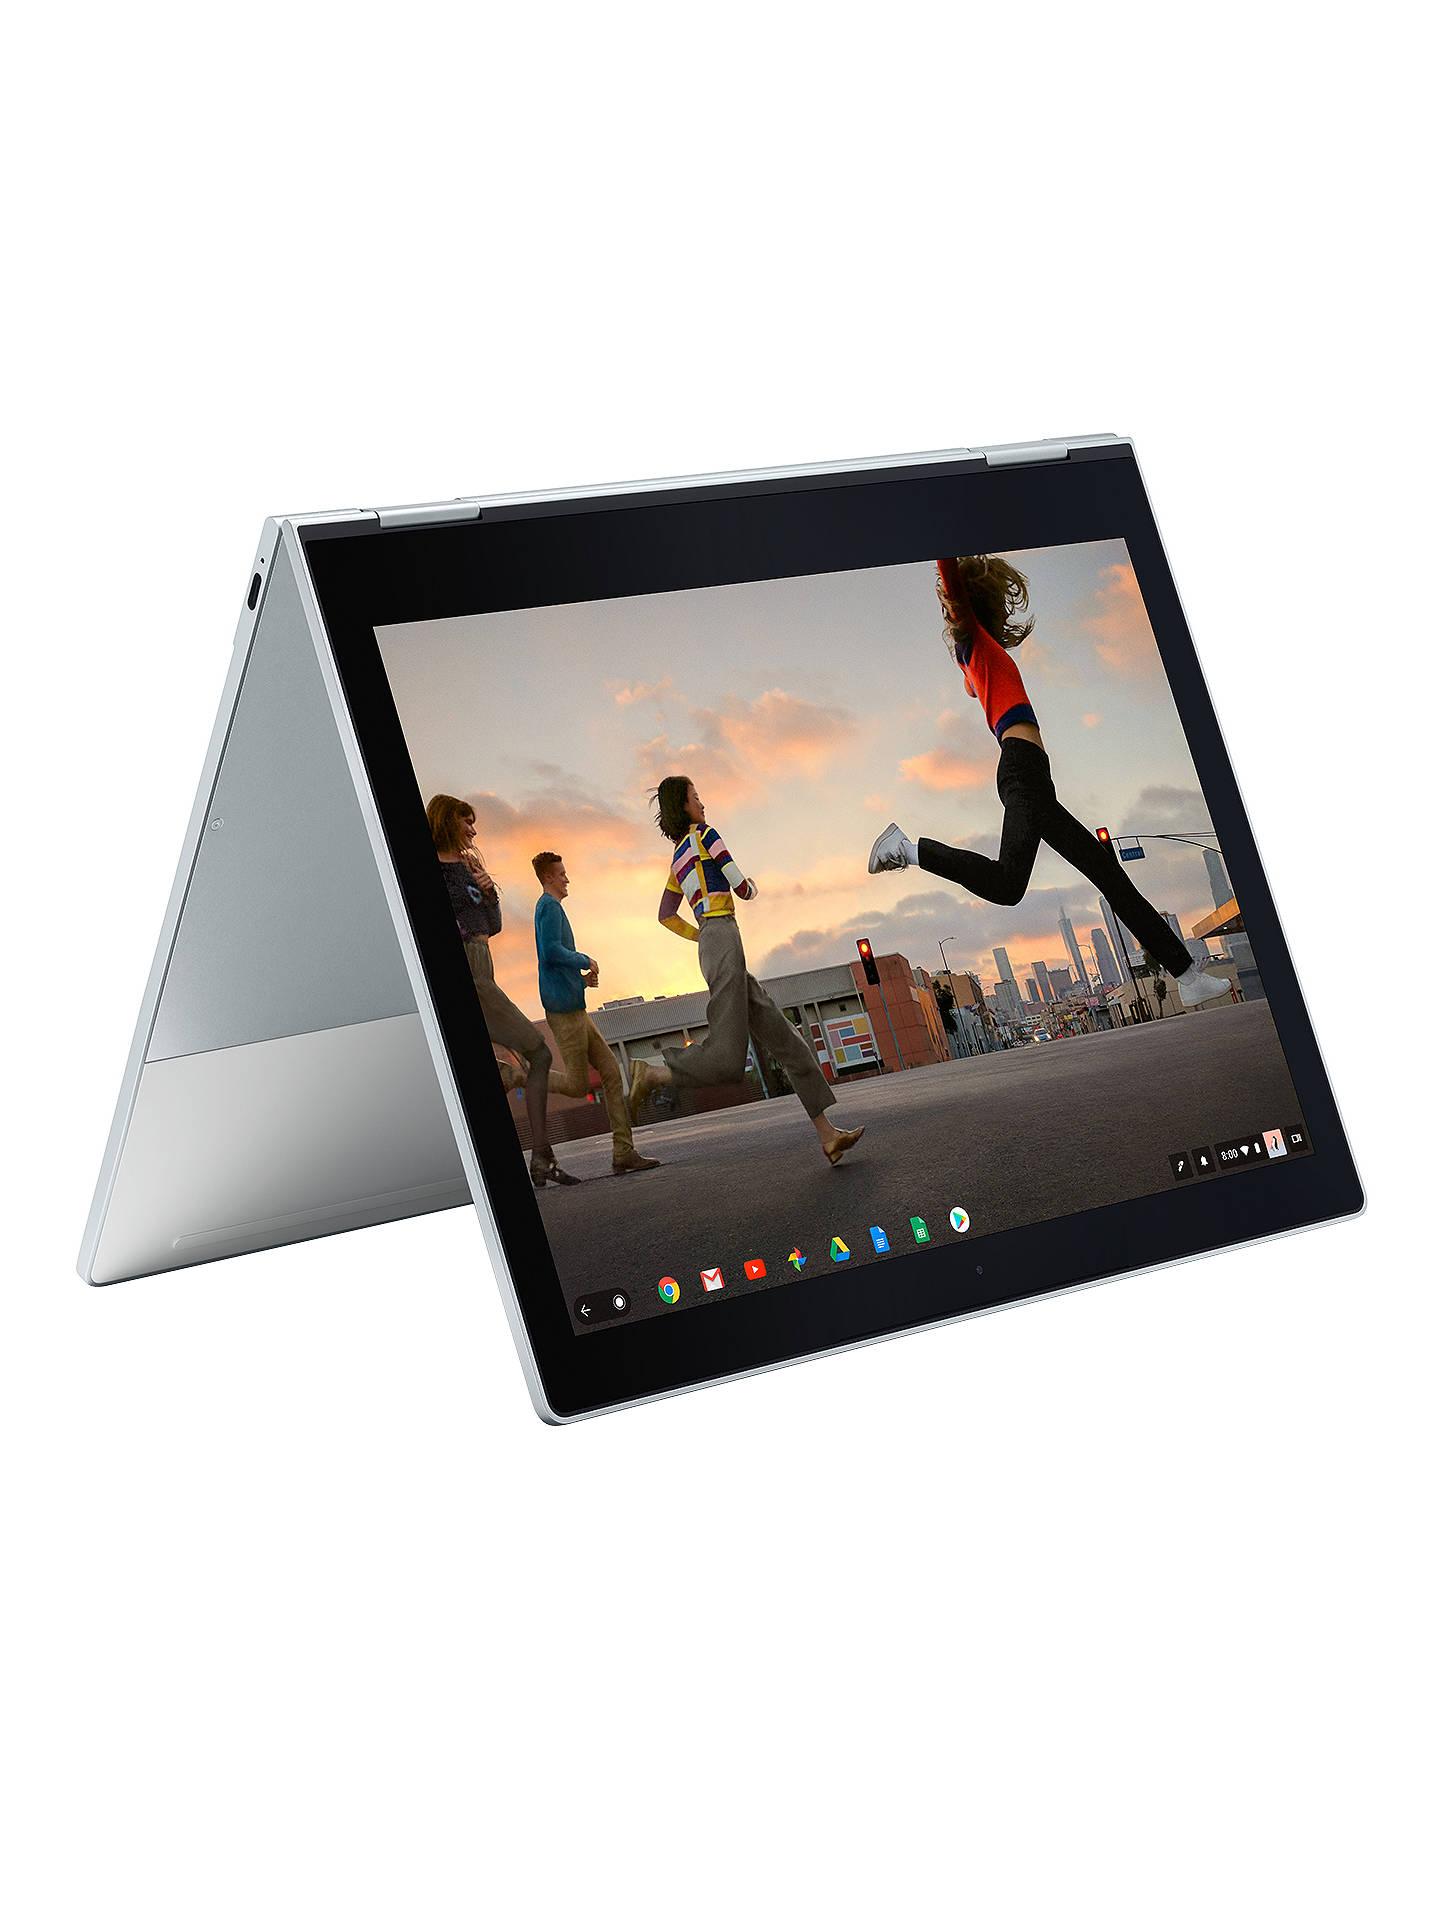 Google Pixelbook - Core i5 - 8GB RAM - 128GB SSD Touchscreen Laptop - £849 @ John Lewis & Partners  / Currys